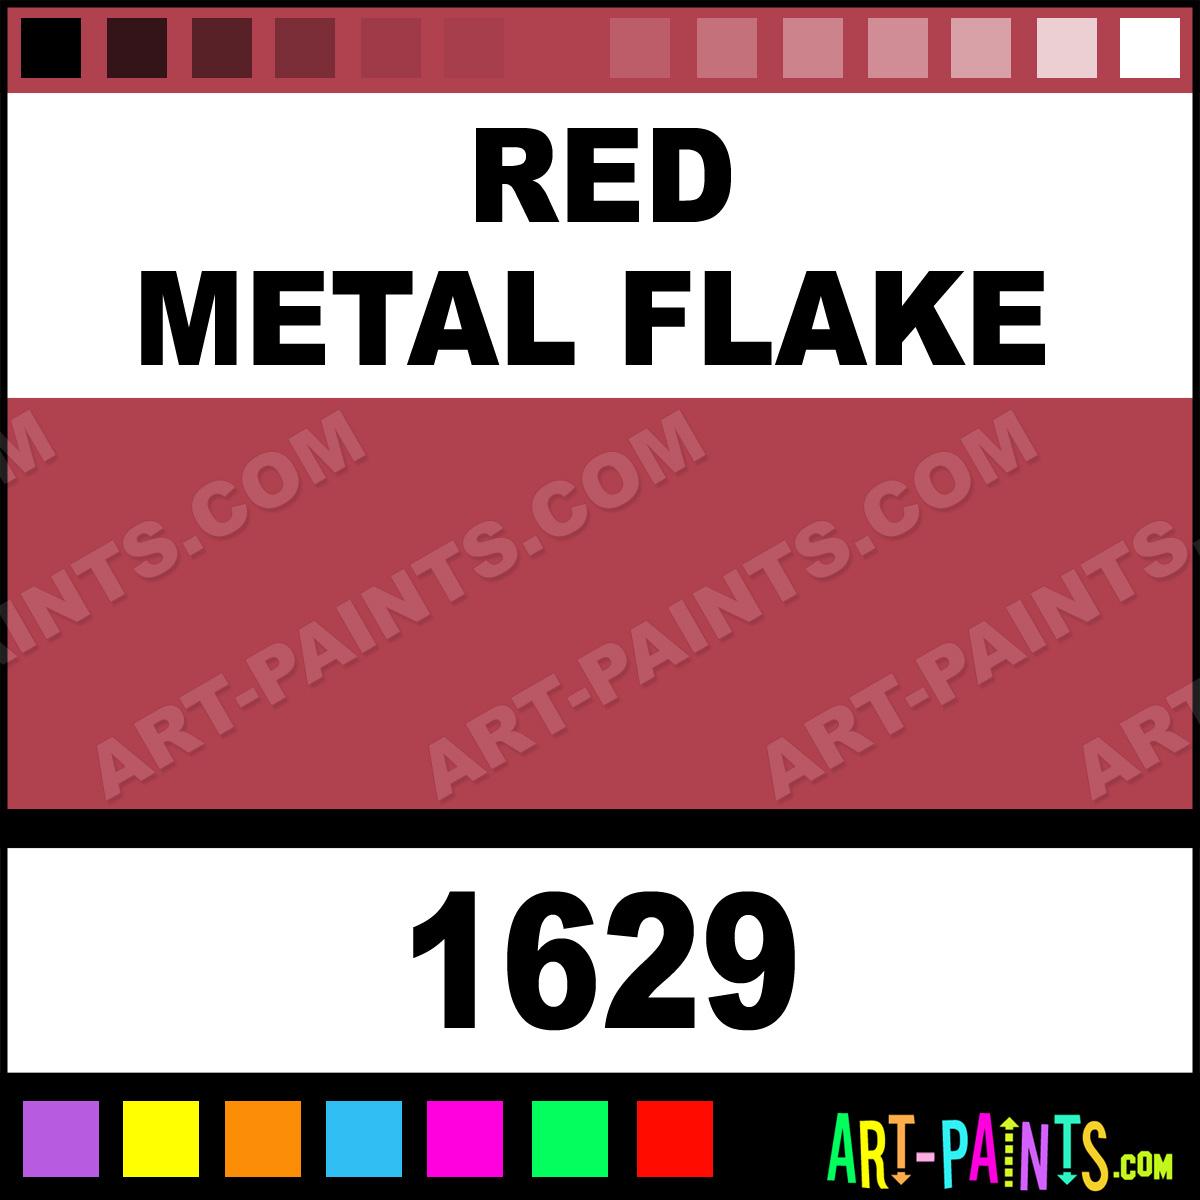 Red Metal Flake Enamel Spray Paints Aerosol Decorative Paints 1629 Red Metal Flake Paint